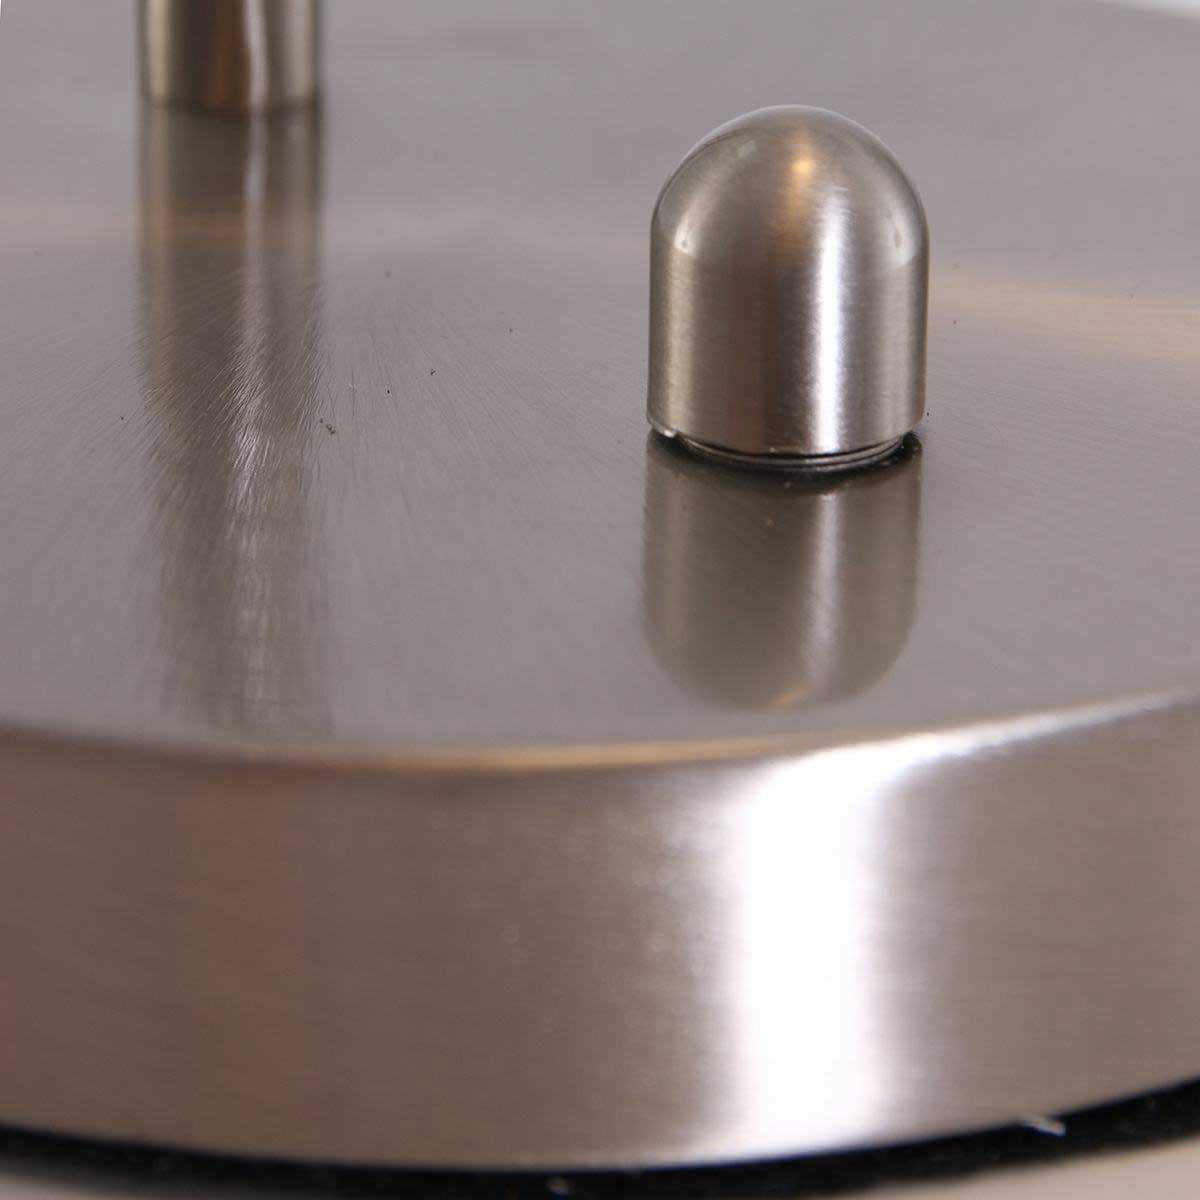 1-lichts LED MEXLITE - 1315ST - tafellamp- klassiek- modern- Mexlite